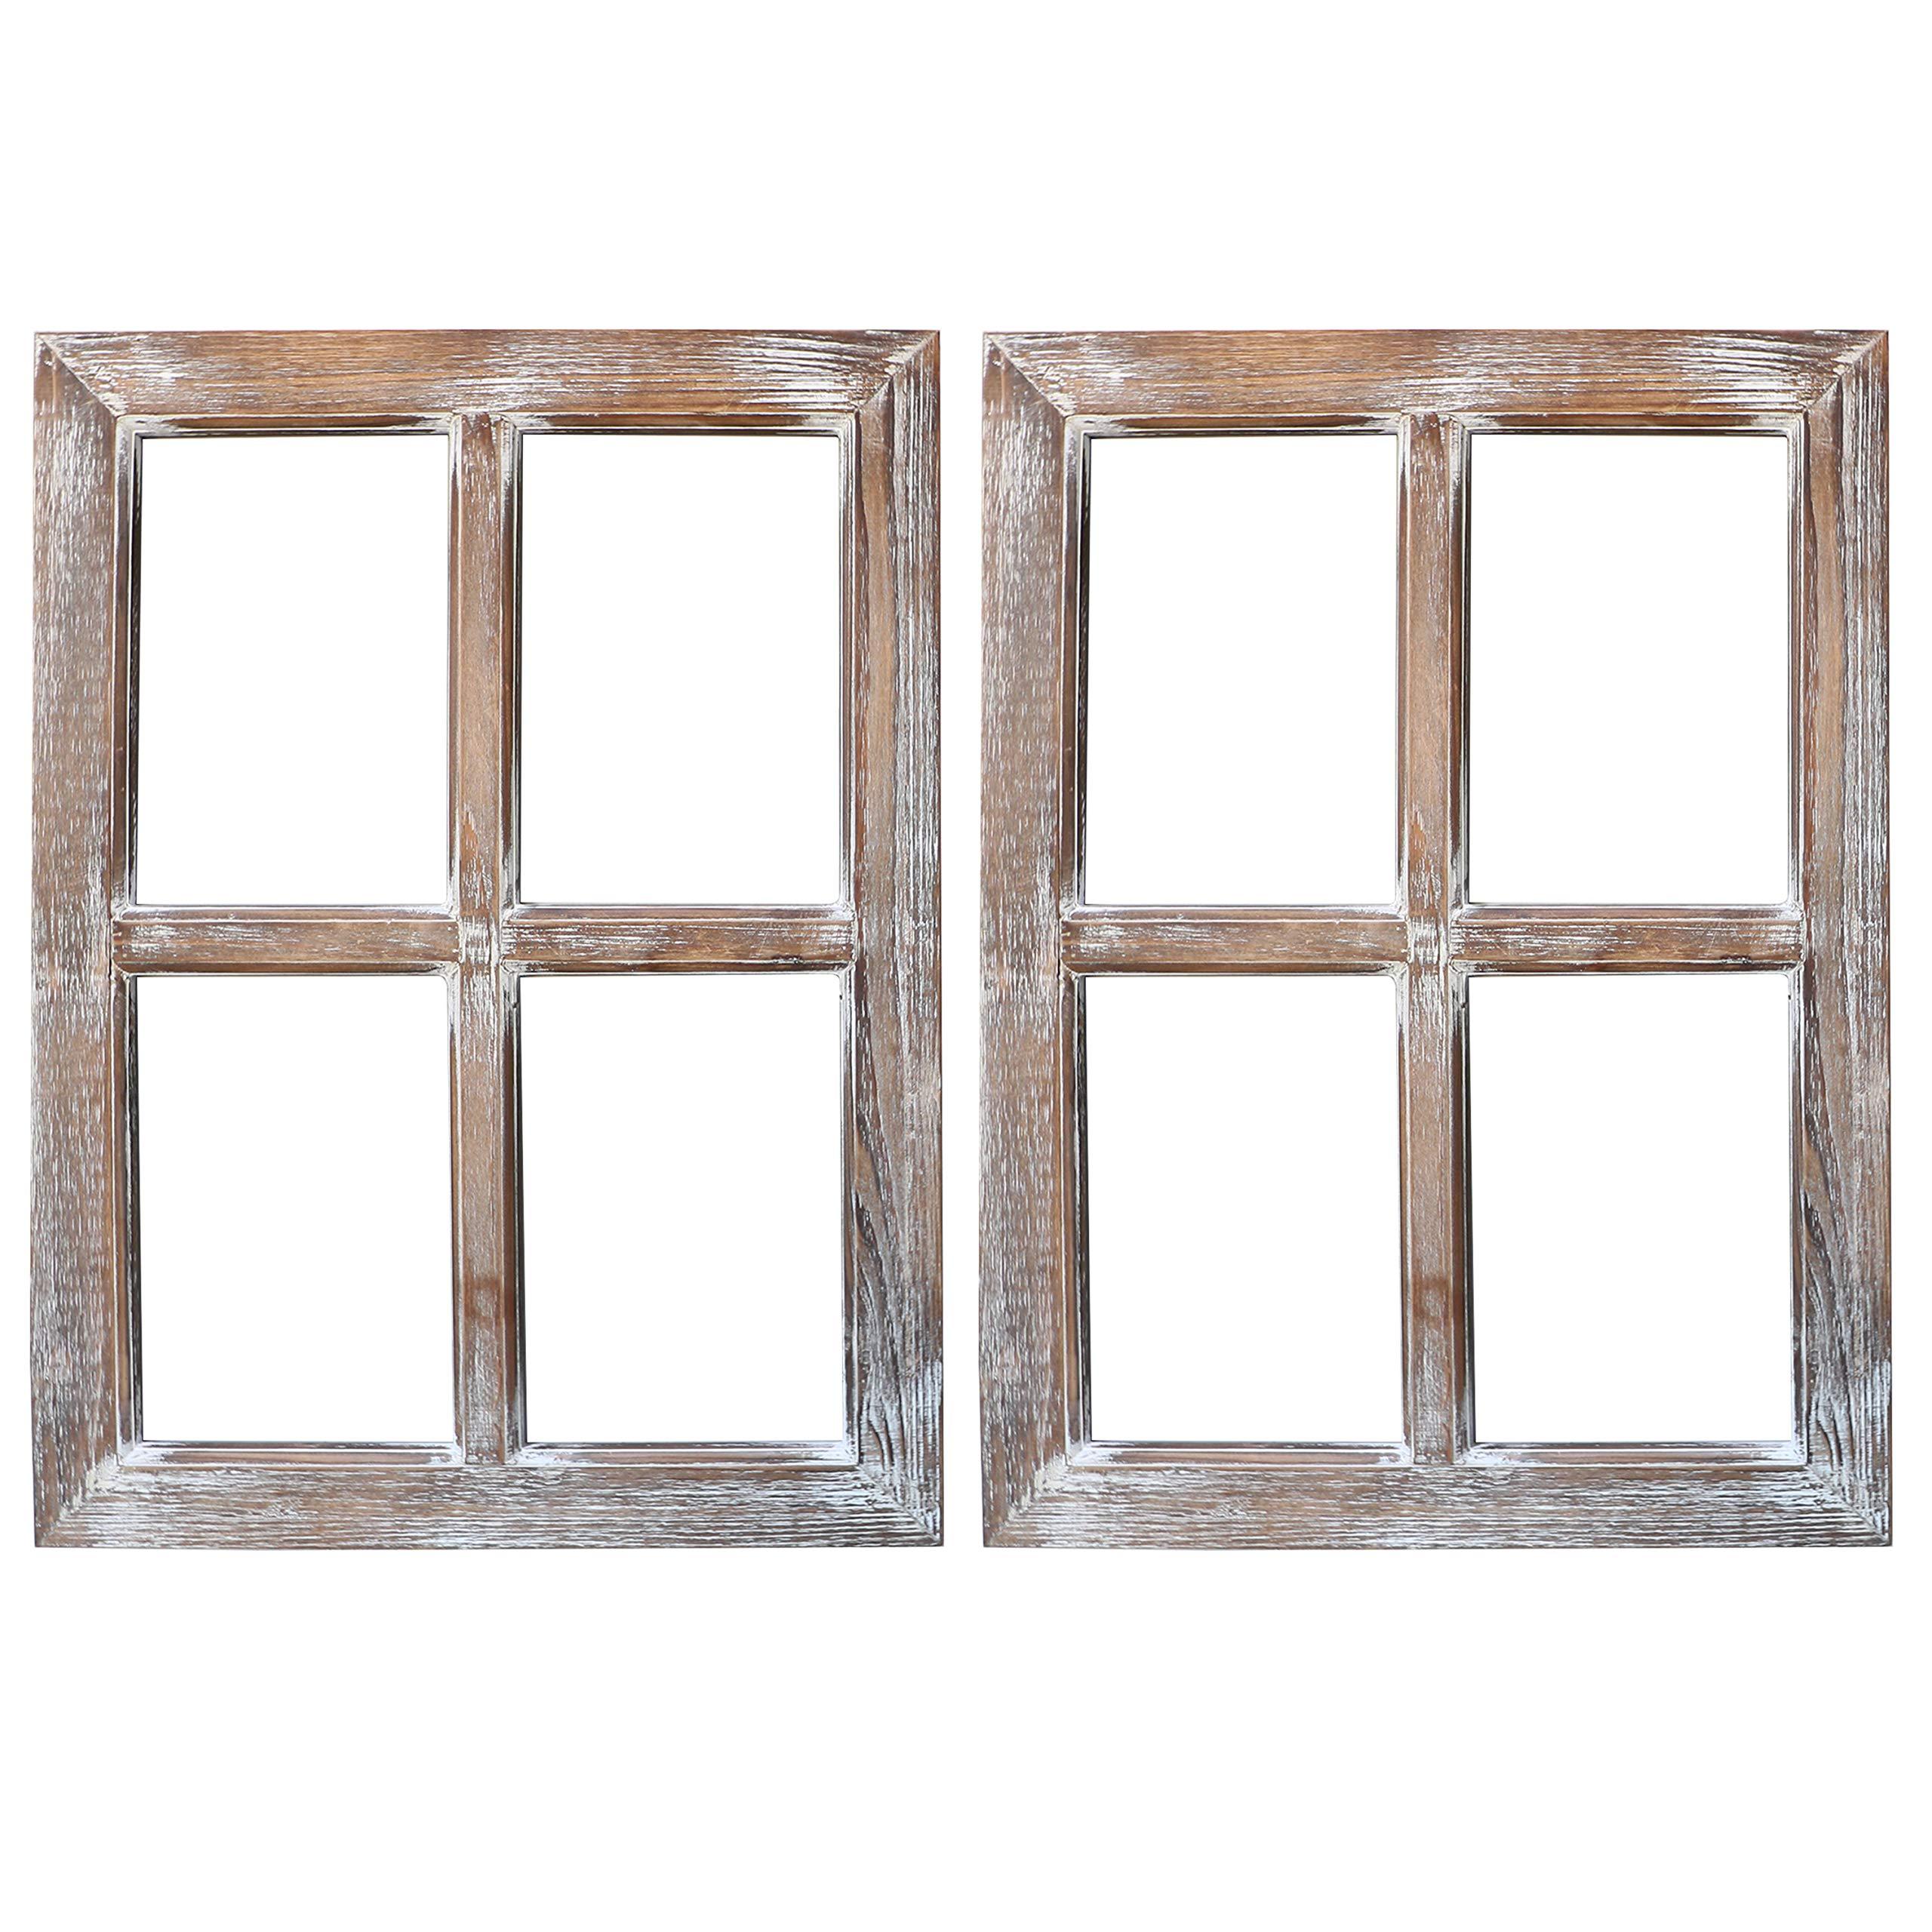 Barnyard Designs Rustic Window Barnwood Frame Primitive Country Farmhouse Wall Decor 18'' x 24'' (2-Pack)